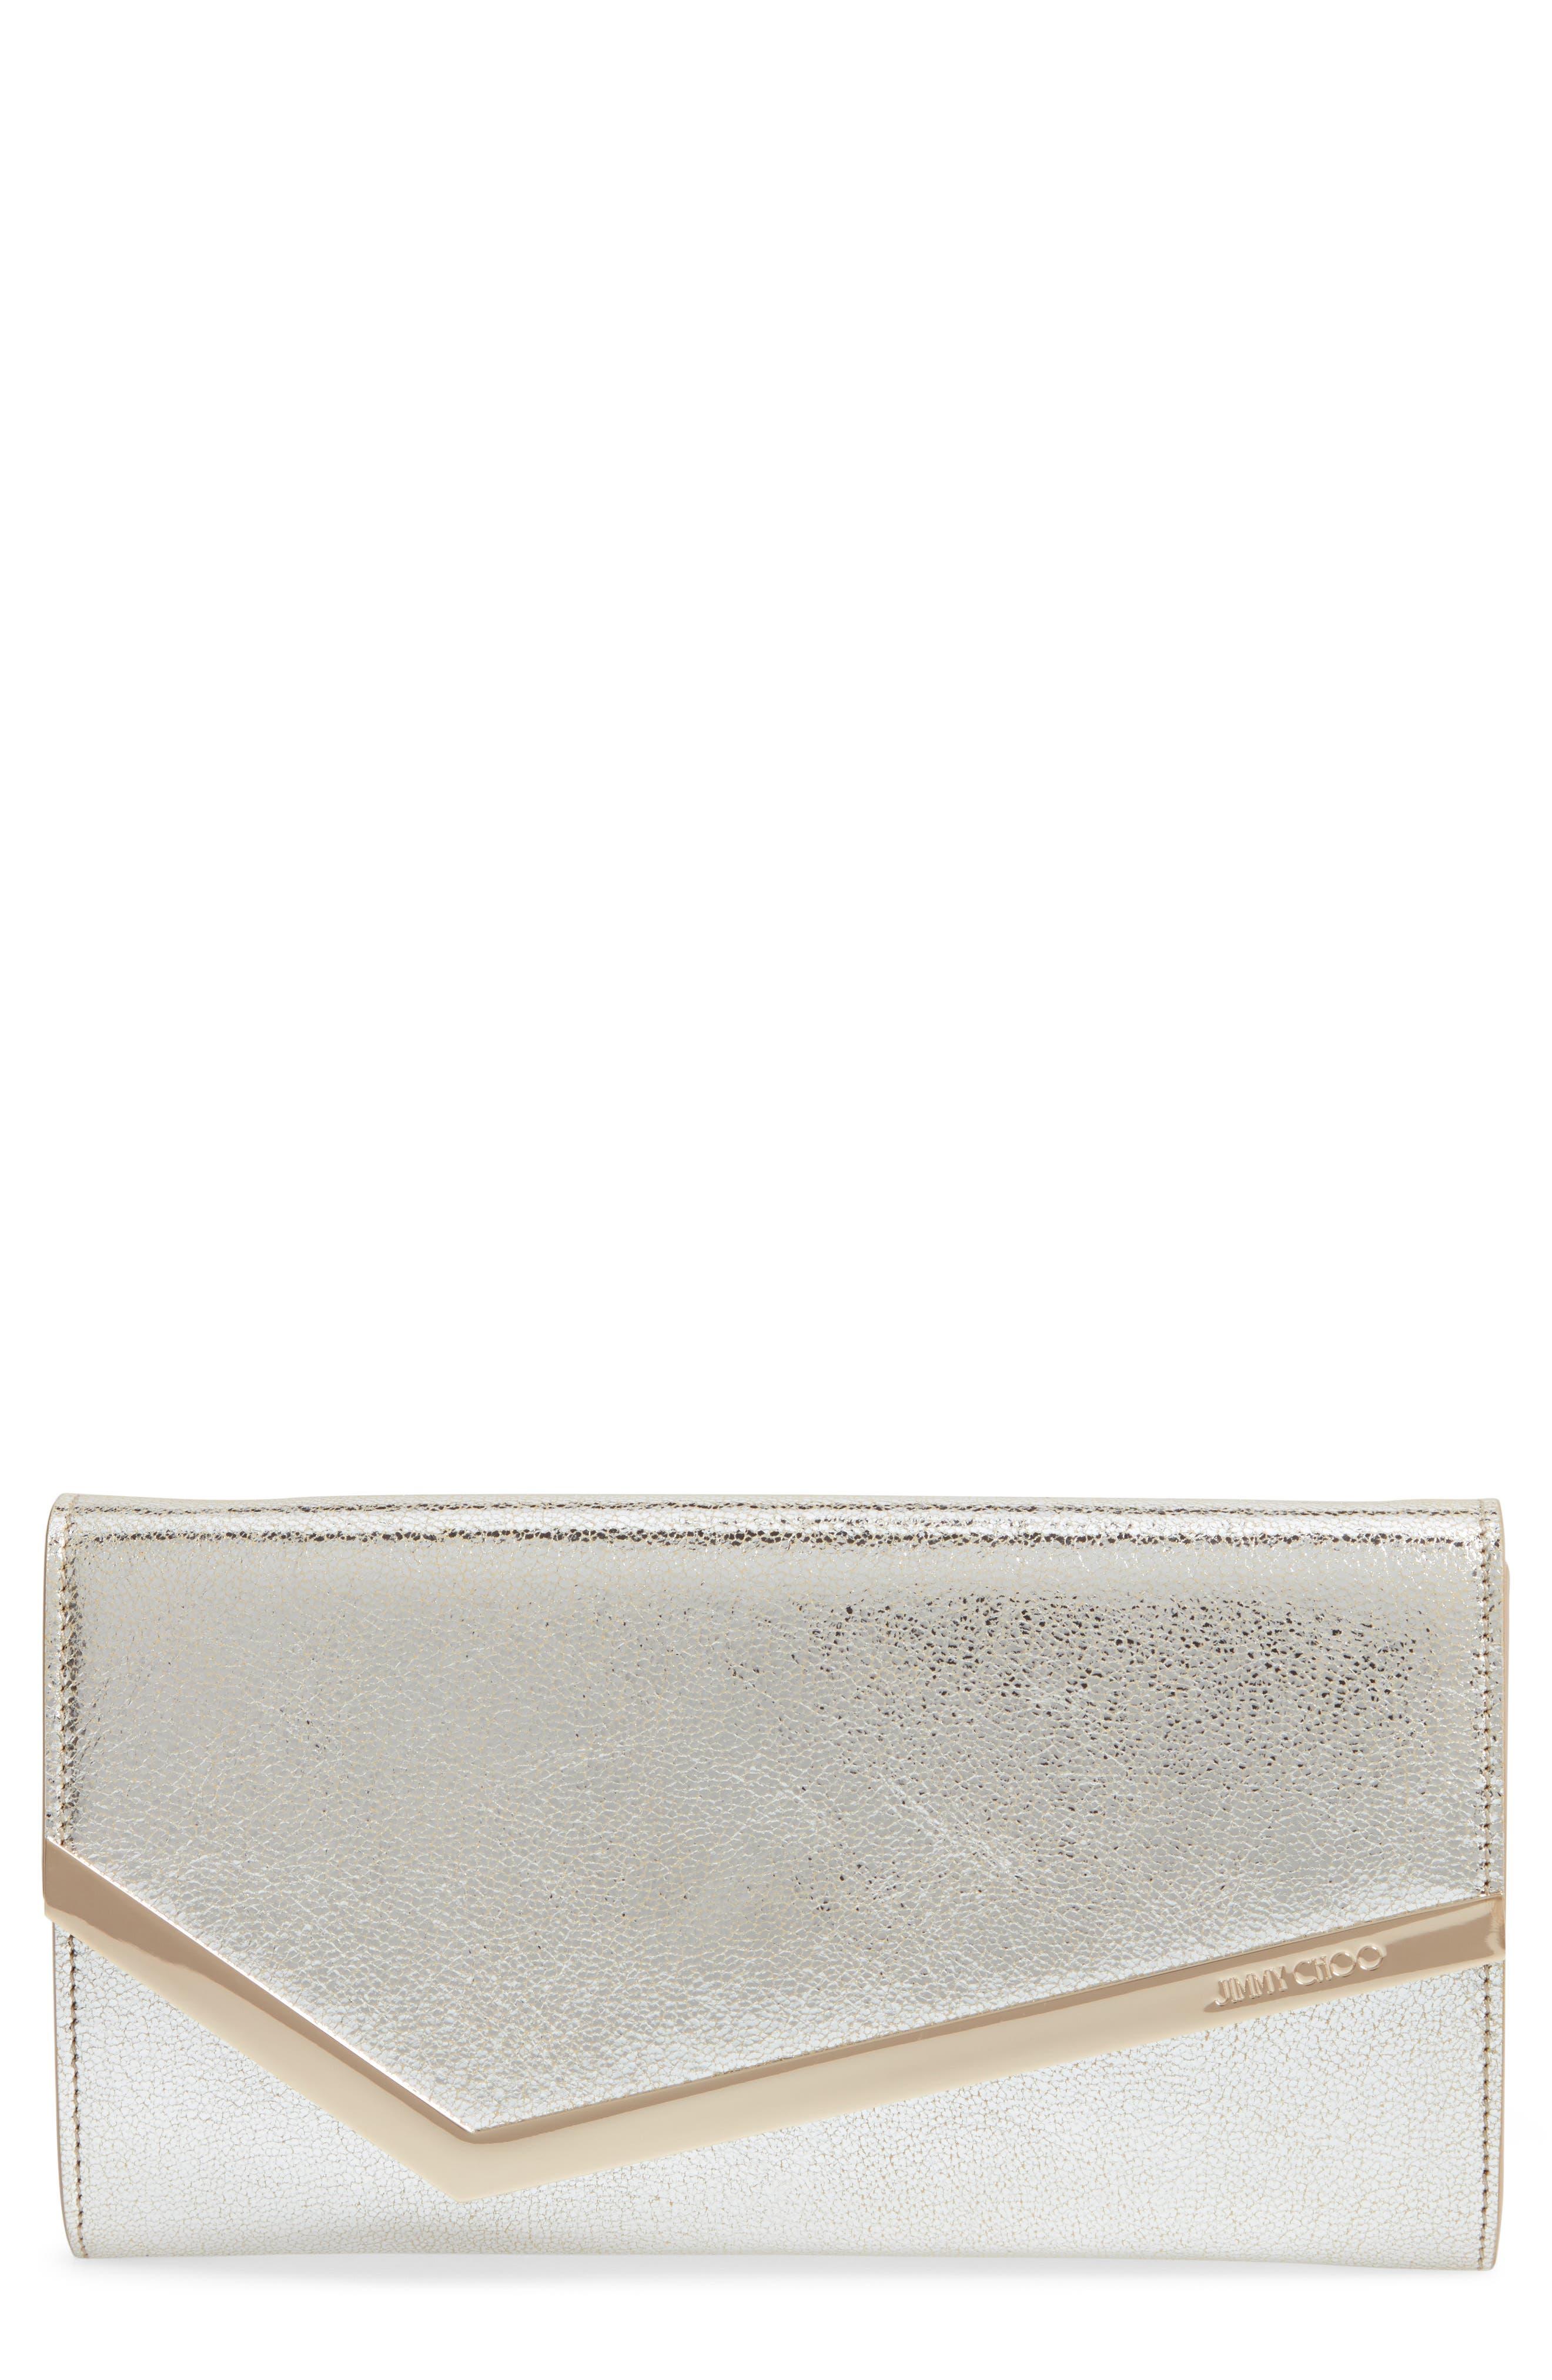 Jimmy Choo Emmie Glitter Leather Clutch   Nordstrom